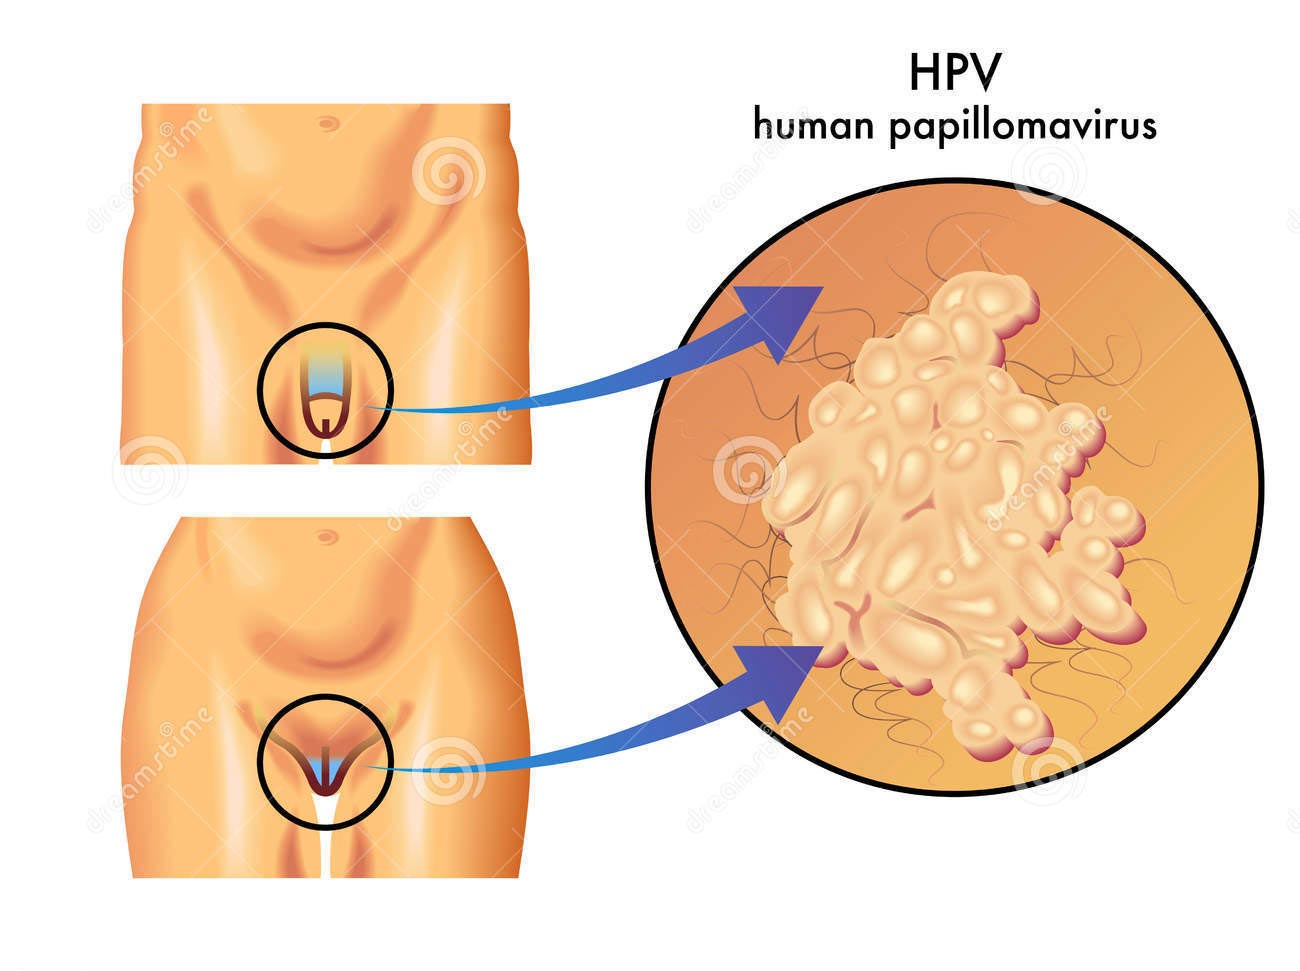 crema per papilloma virus umano human papillomavirus homeopathy